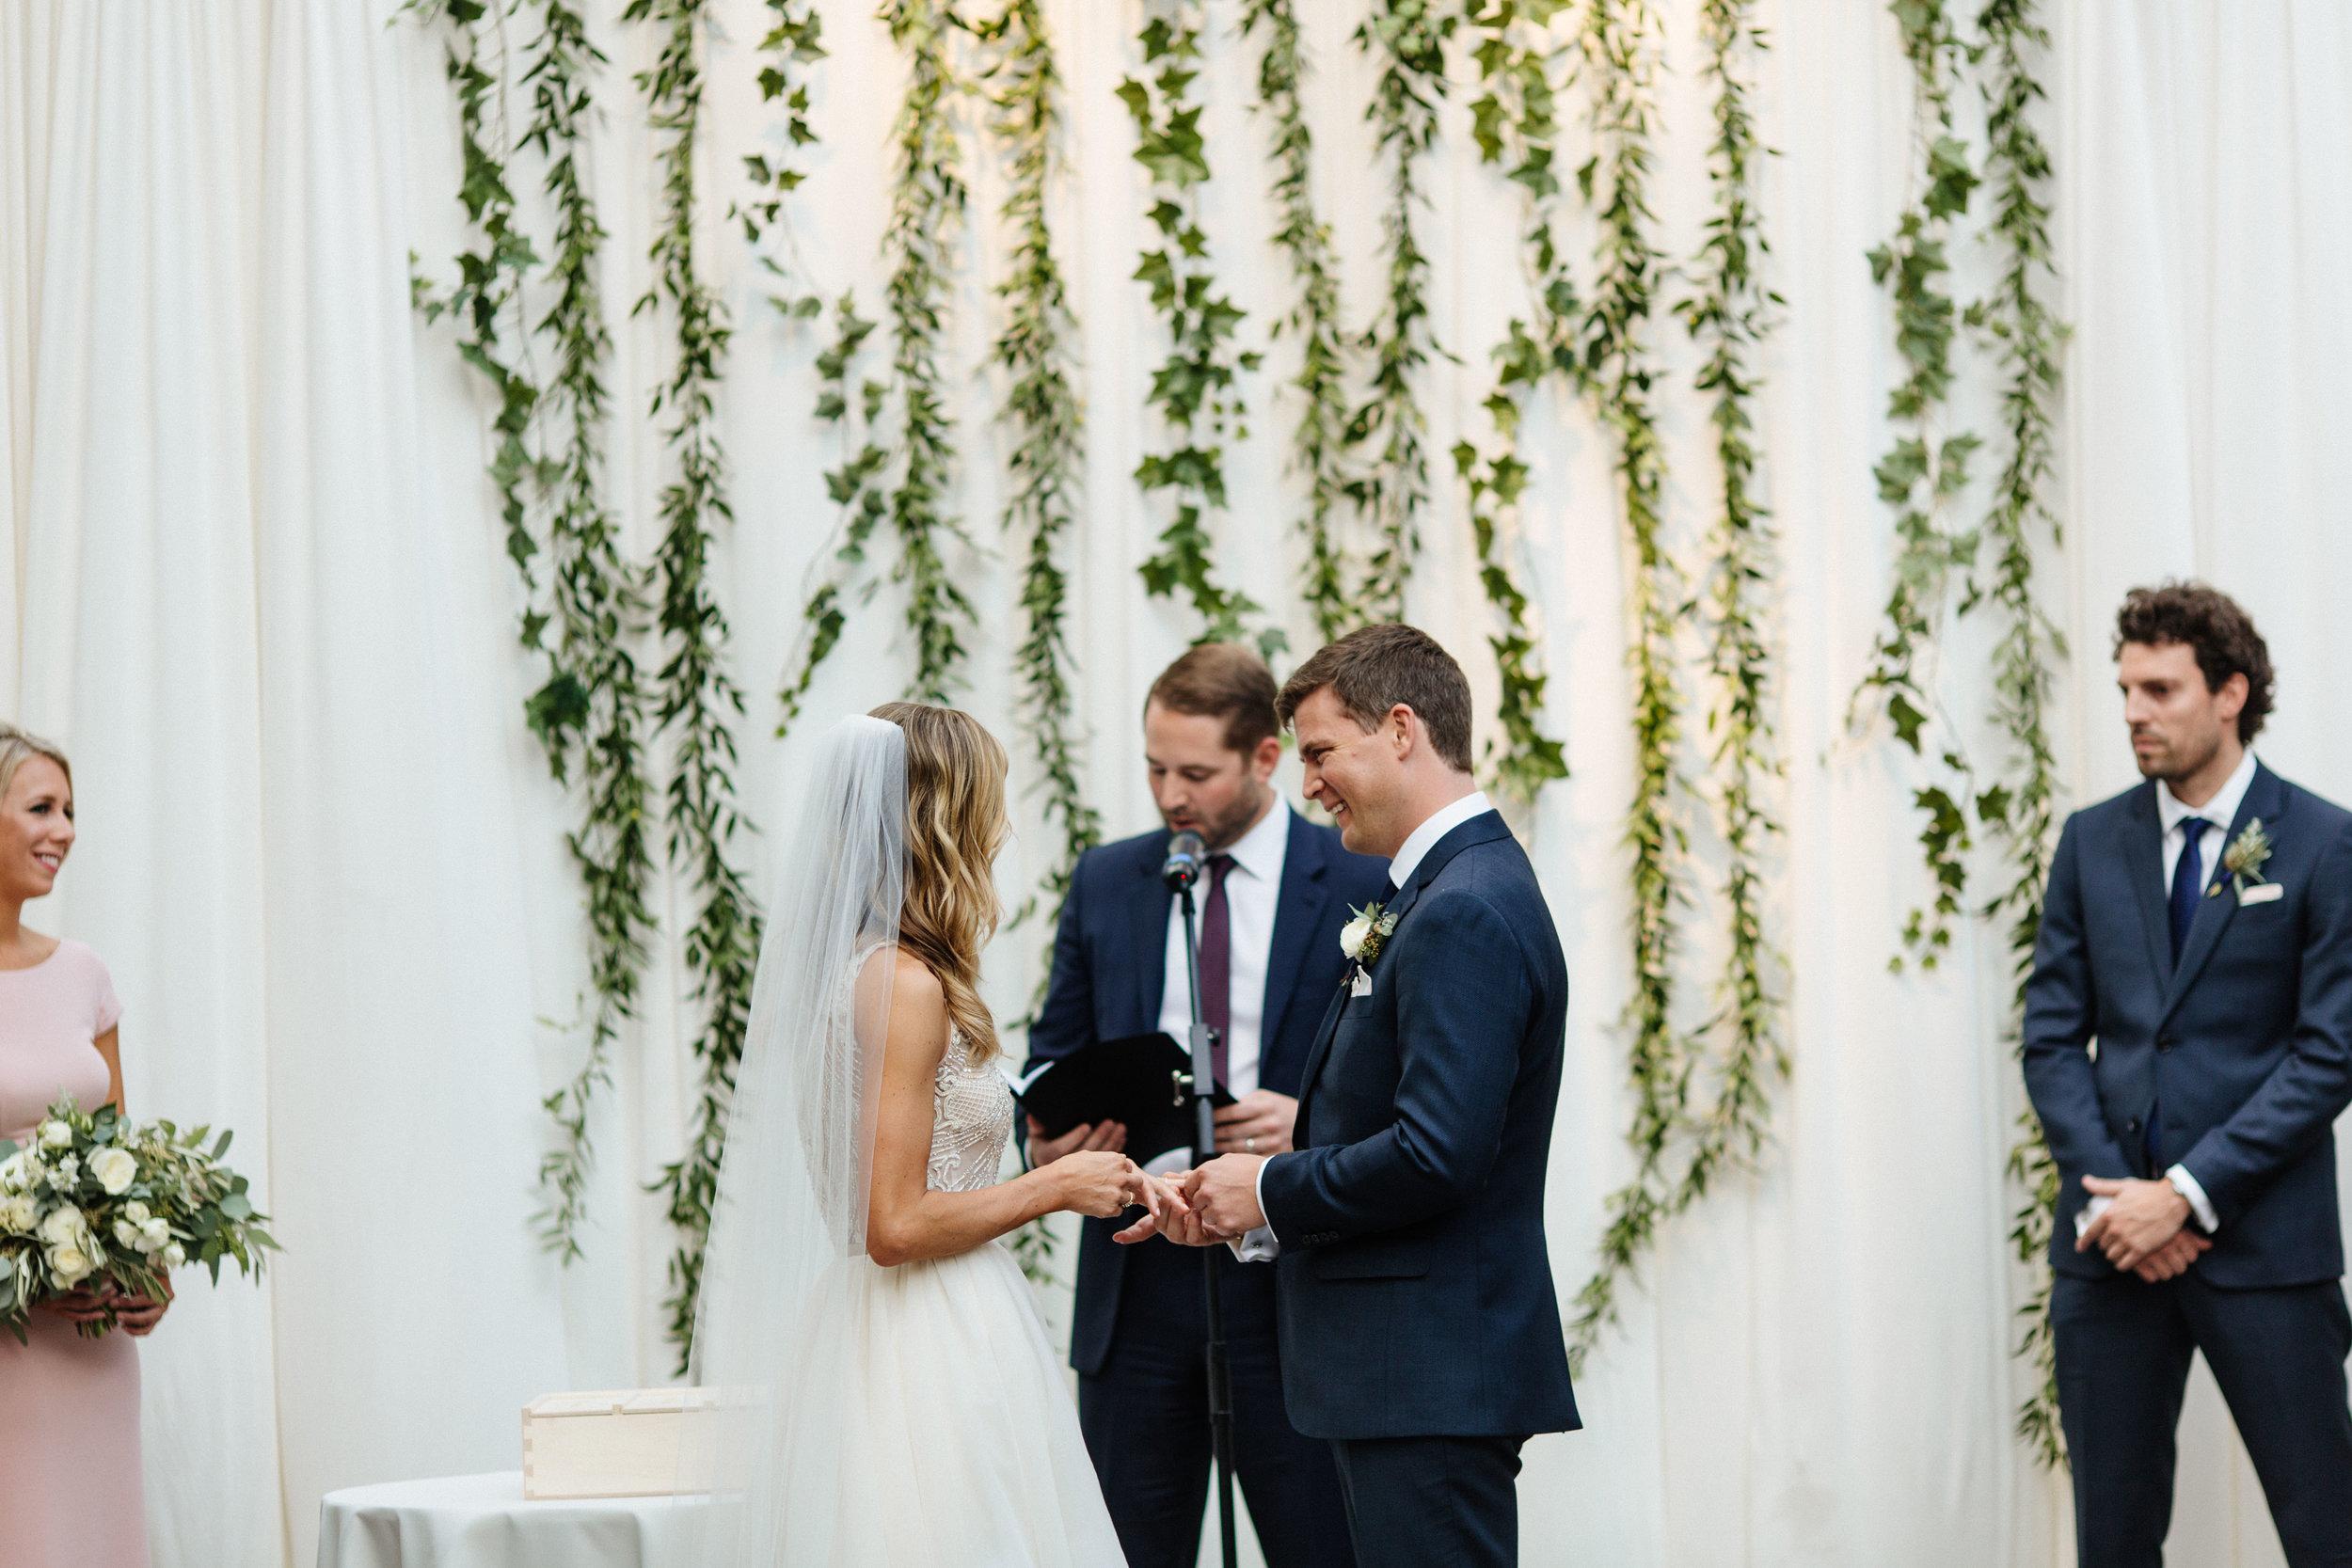 04_jukes_wedding-128.JPG